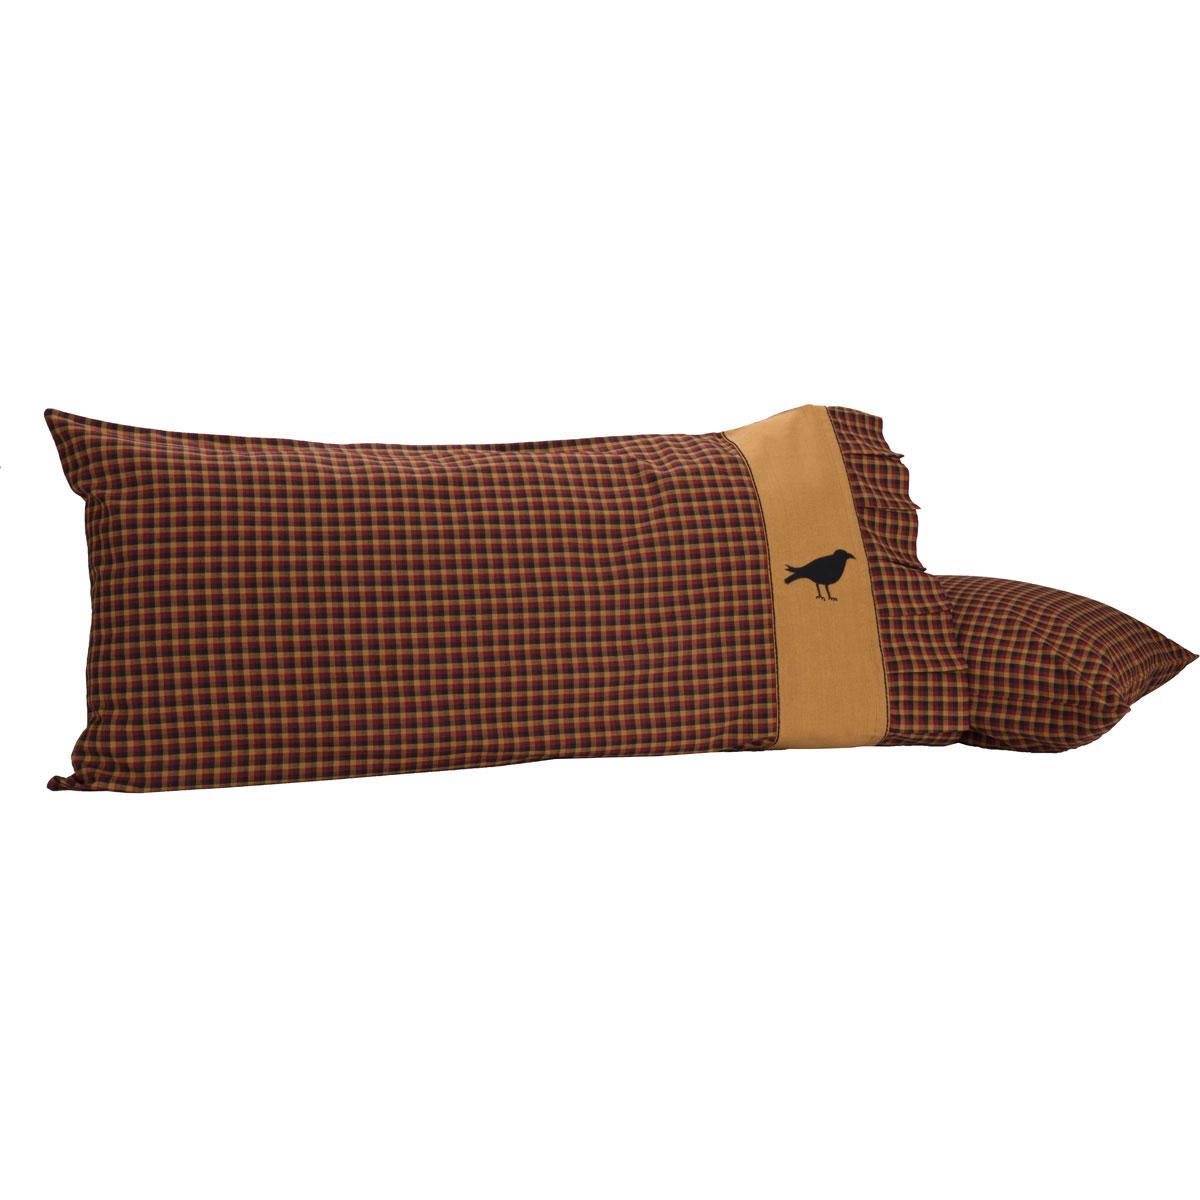 Heritage Farms Crow King Pillow Case Set of 2 21x40